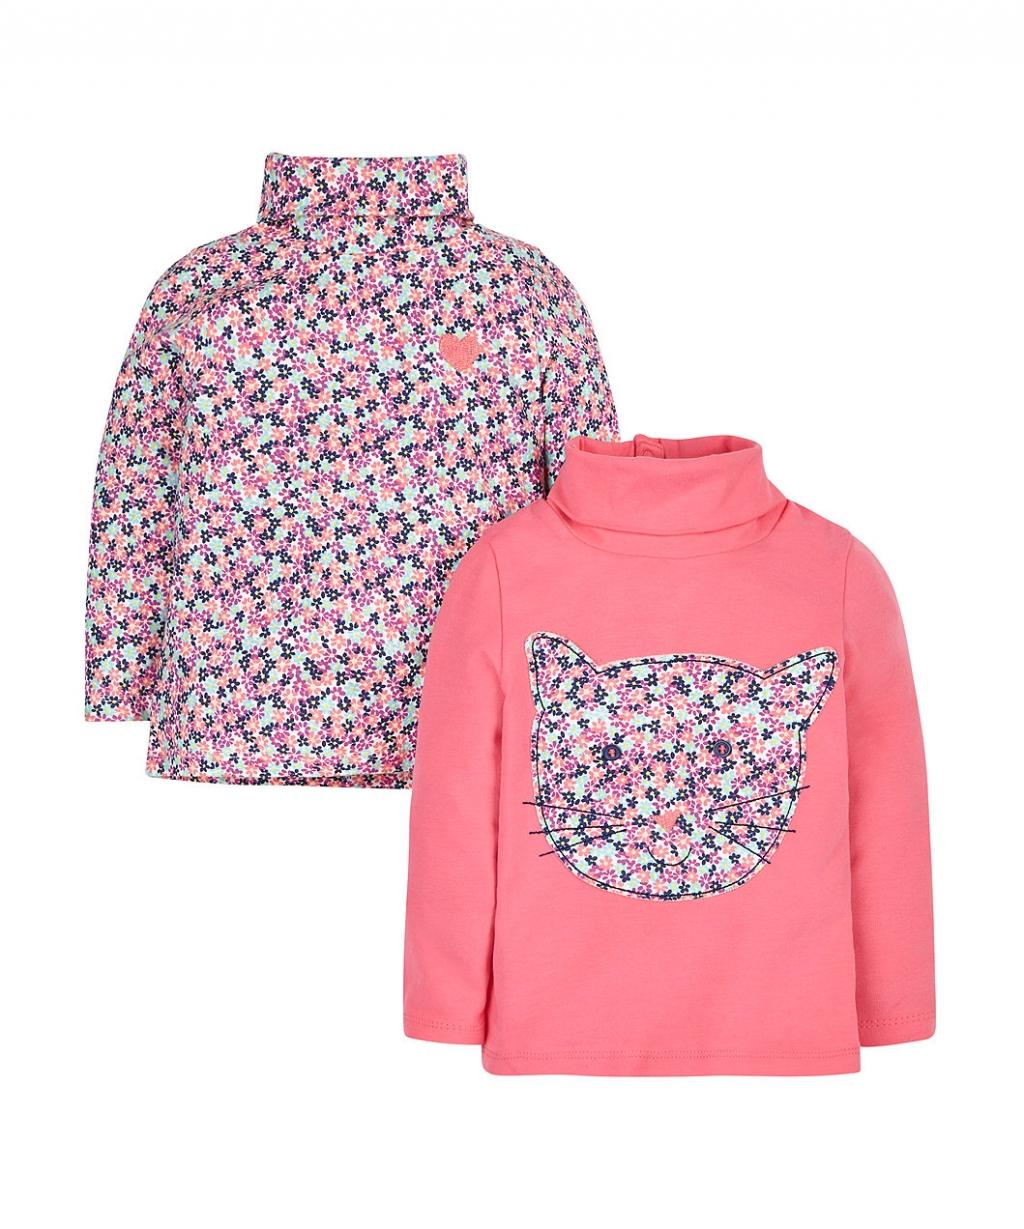 Теплый гольф для девочки Roll Neck Tops - 2 Pack (Mothercare)